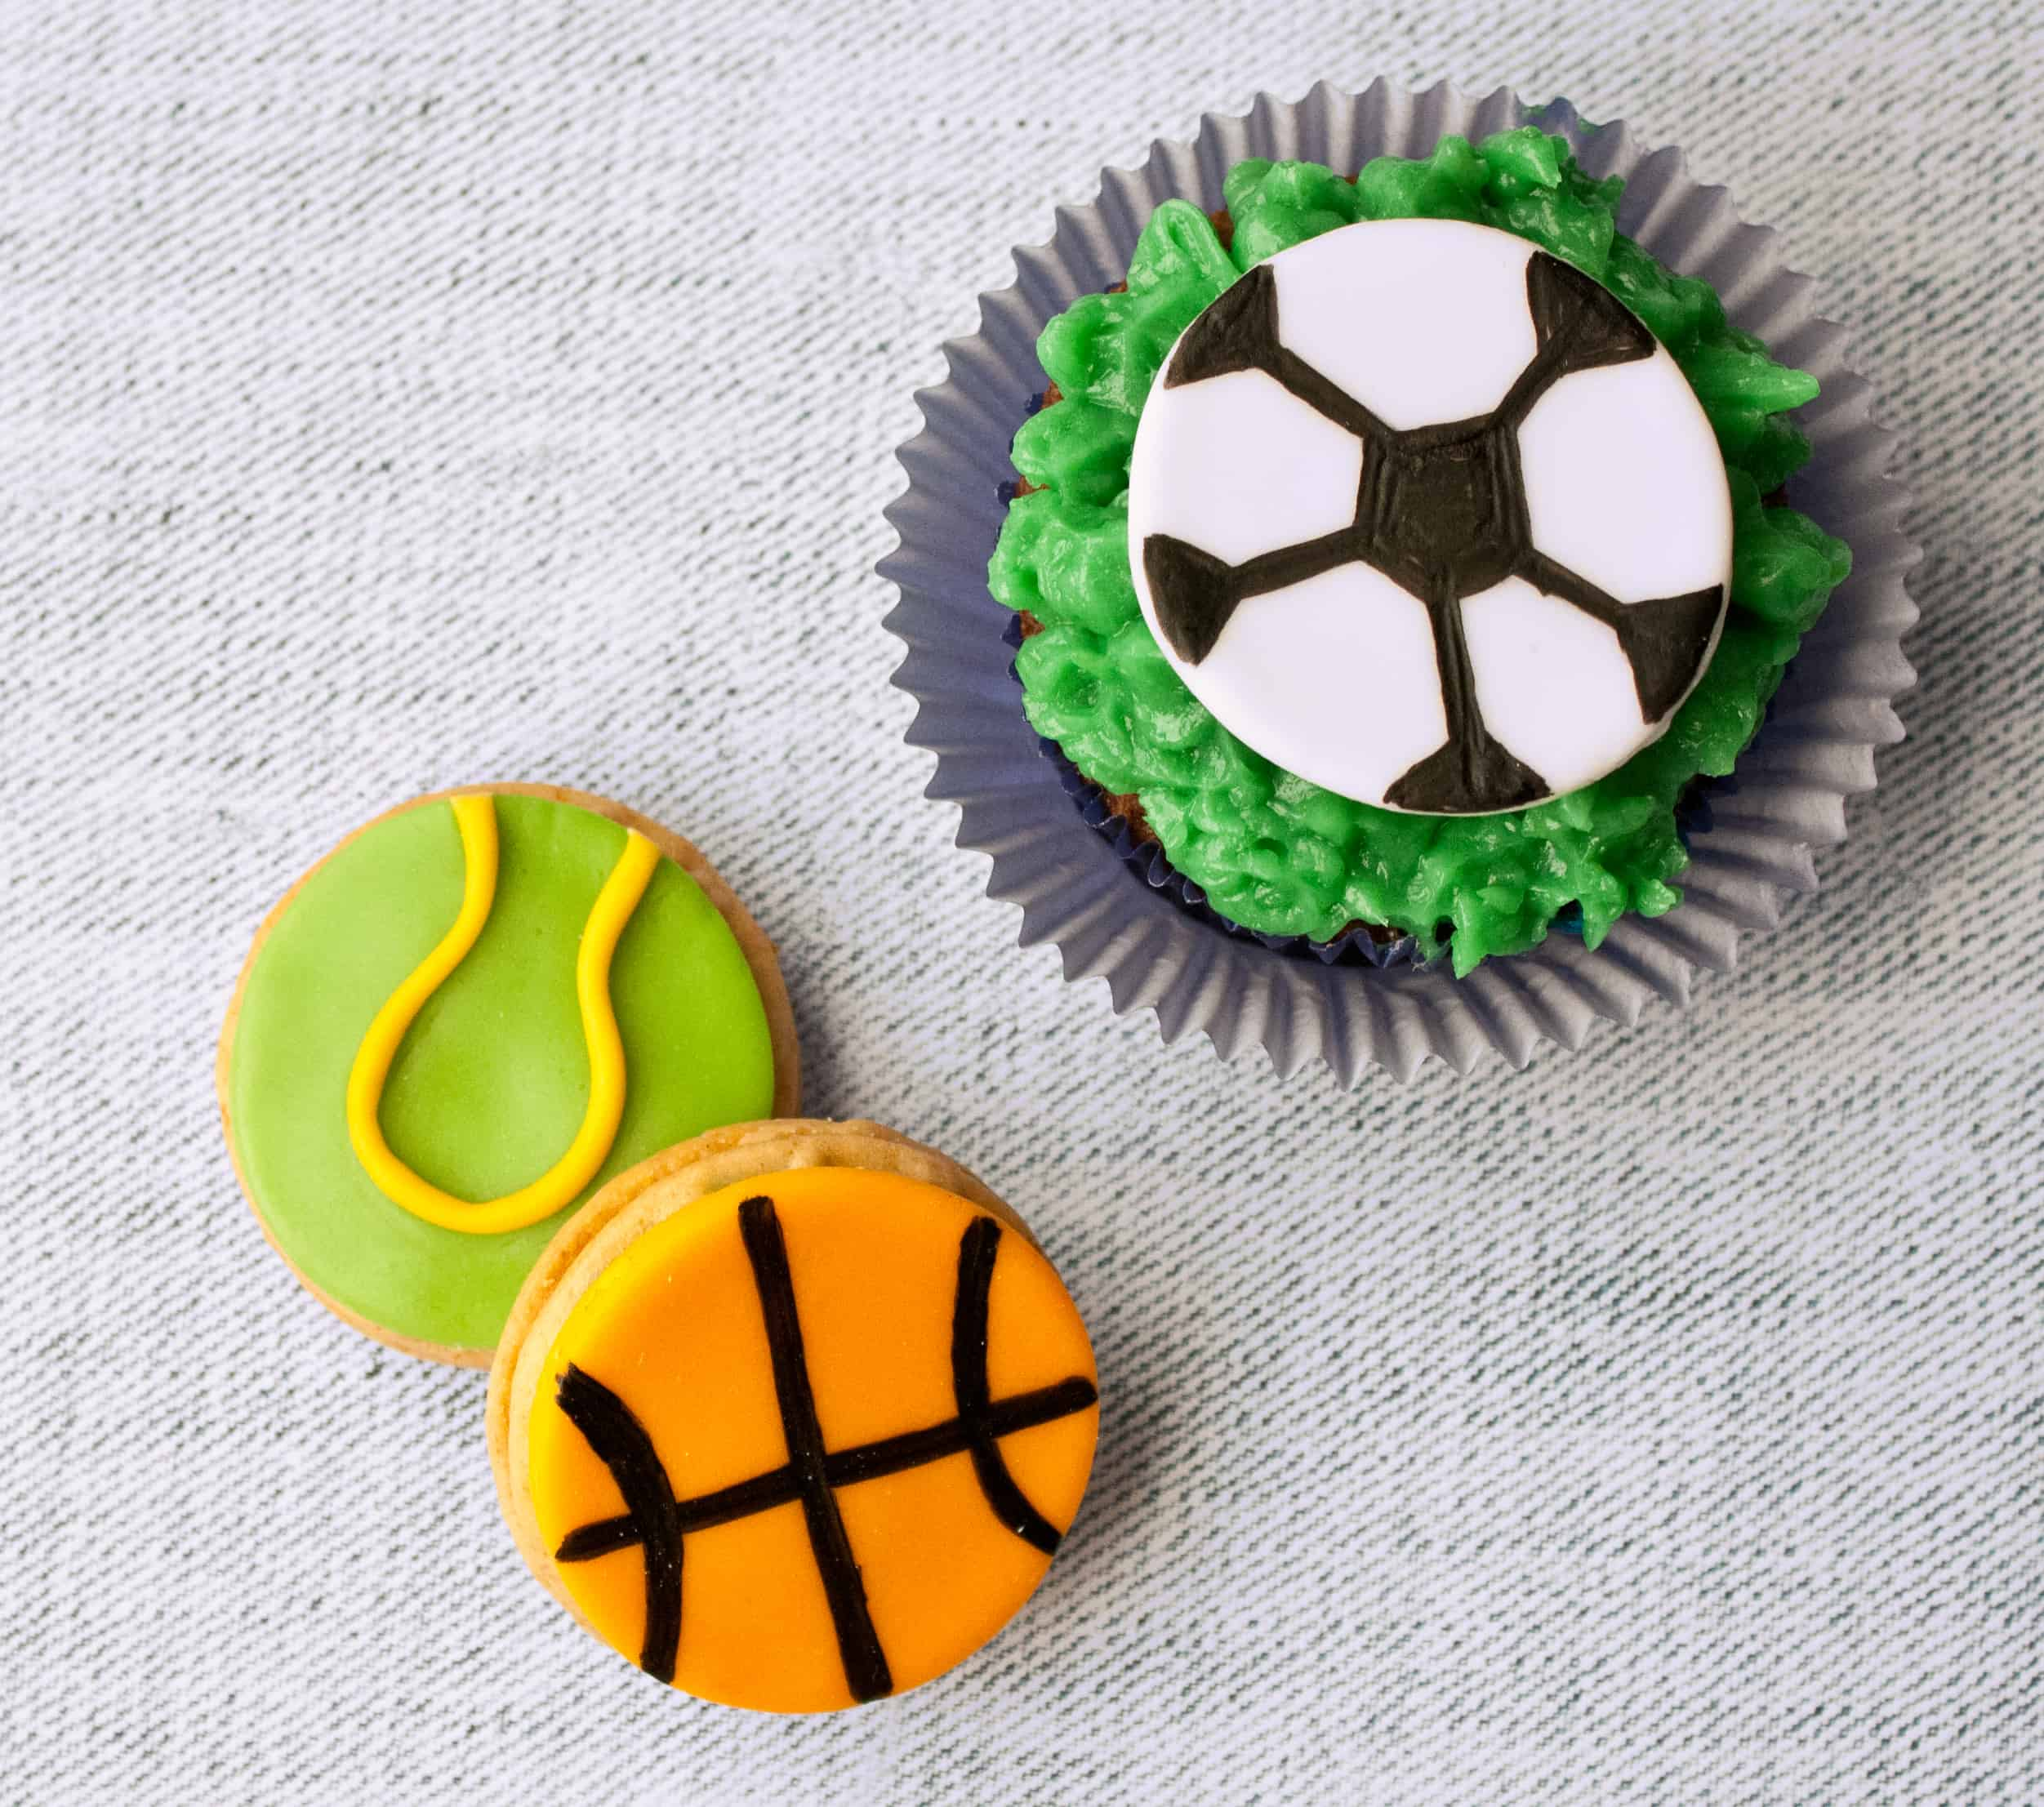 fondant basketball, tennis, soccer balls